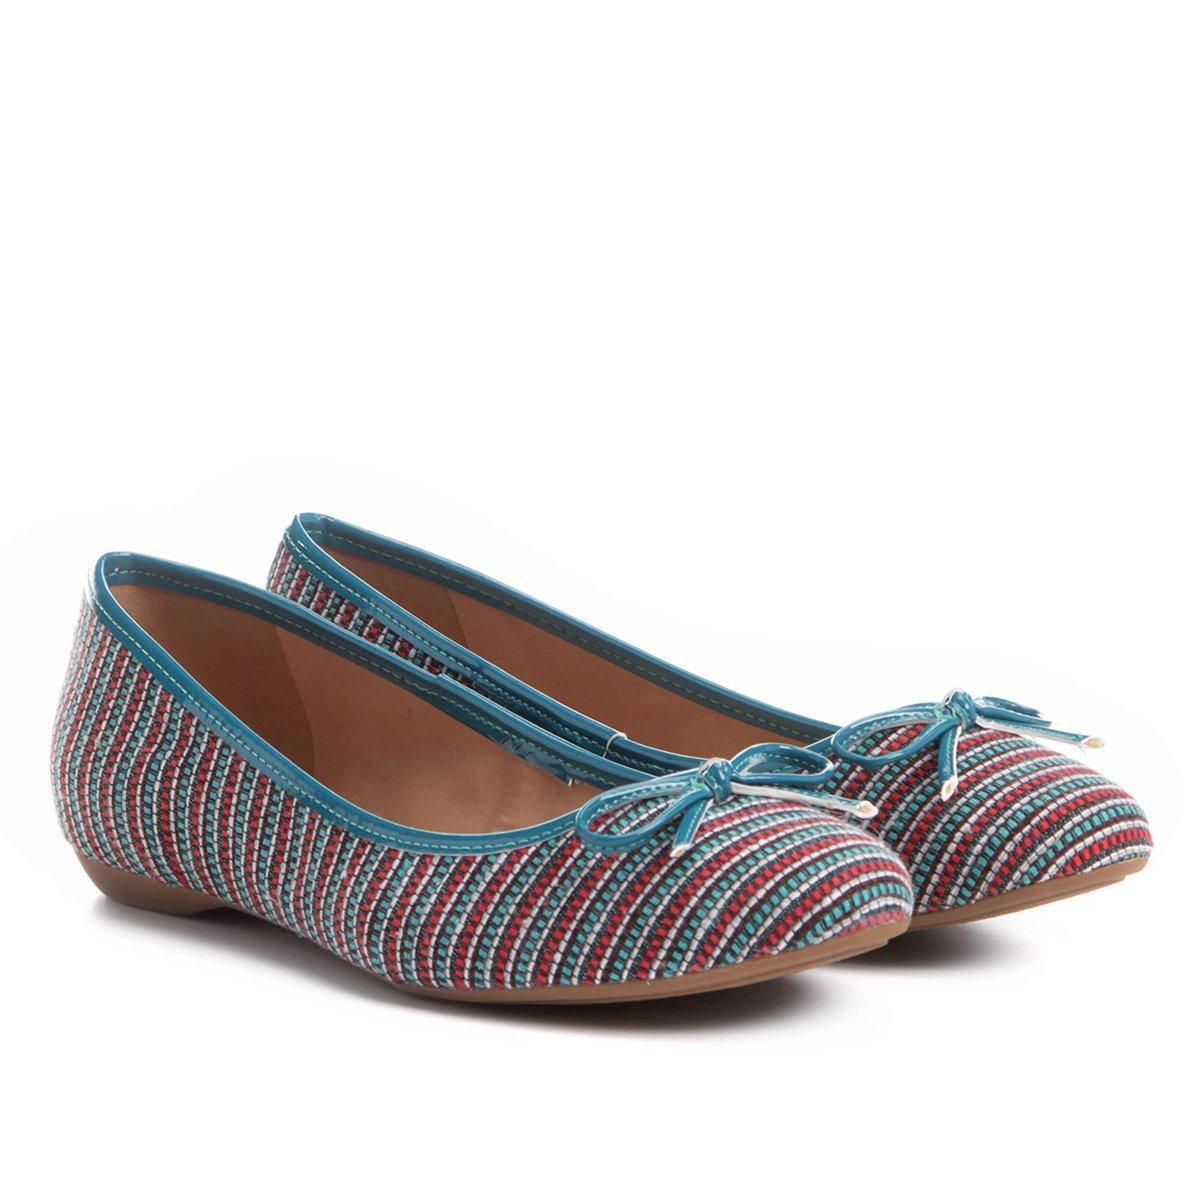 903d3b0ae Sapatilha Shoestock Bico Redondo Laço Feminina - Compre Agora | Zattini